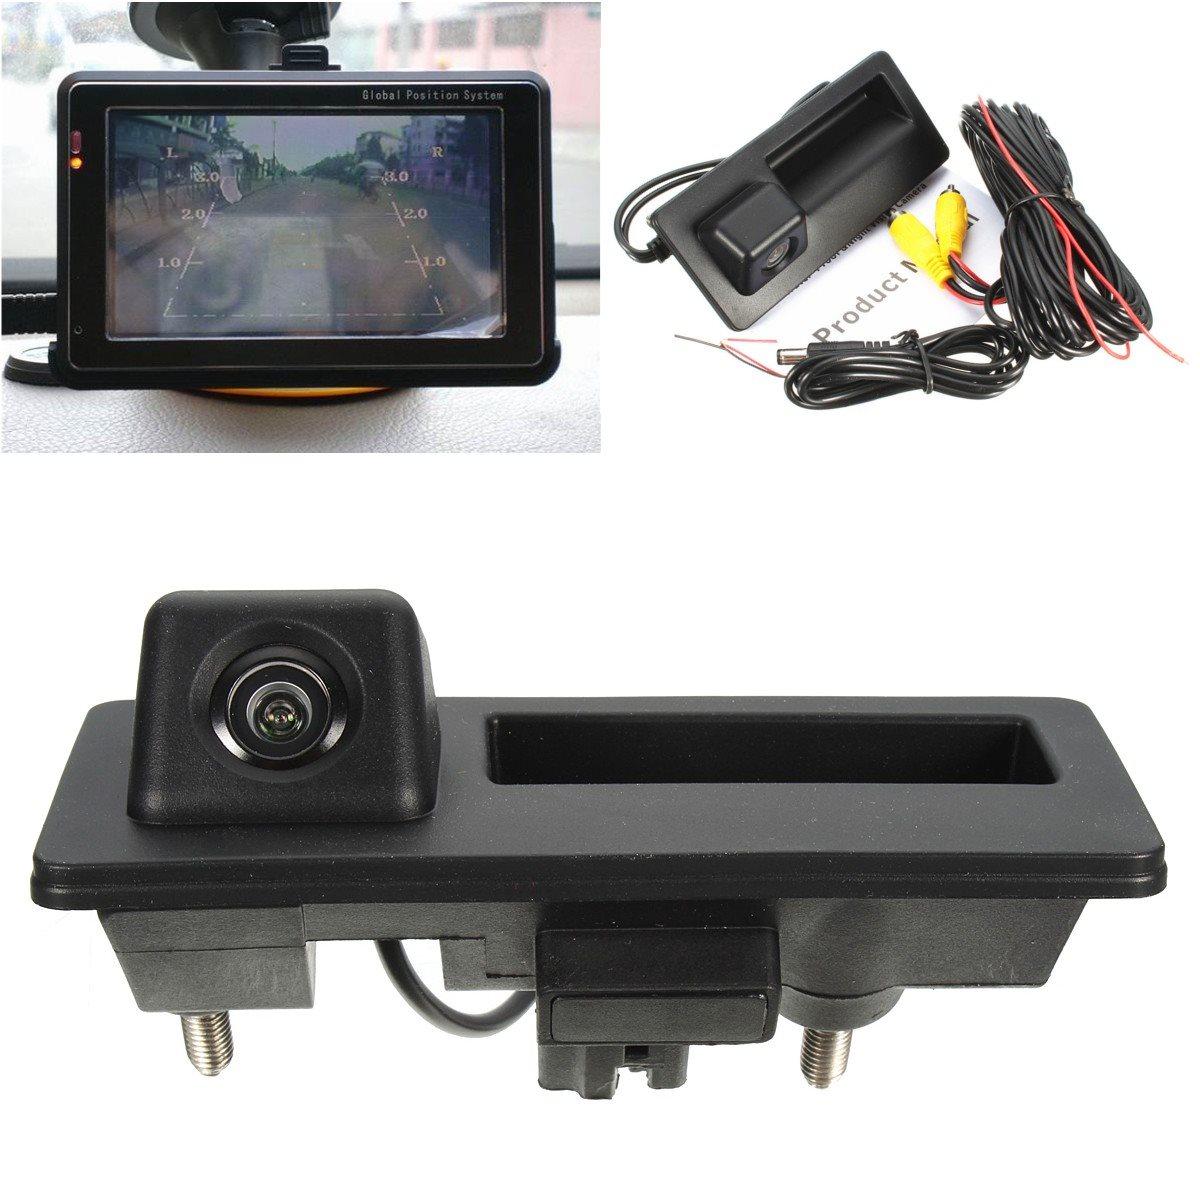 Hot Car Rear View Cameras Reversing Reverse Camera For VW /JETTA /TIGUAN /RCD510 /RNS315 /RNS310 /RNS510